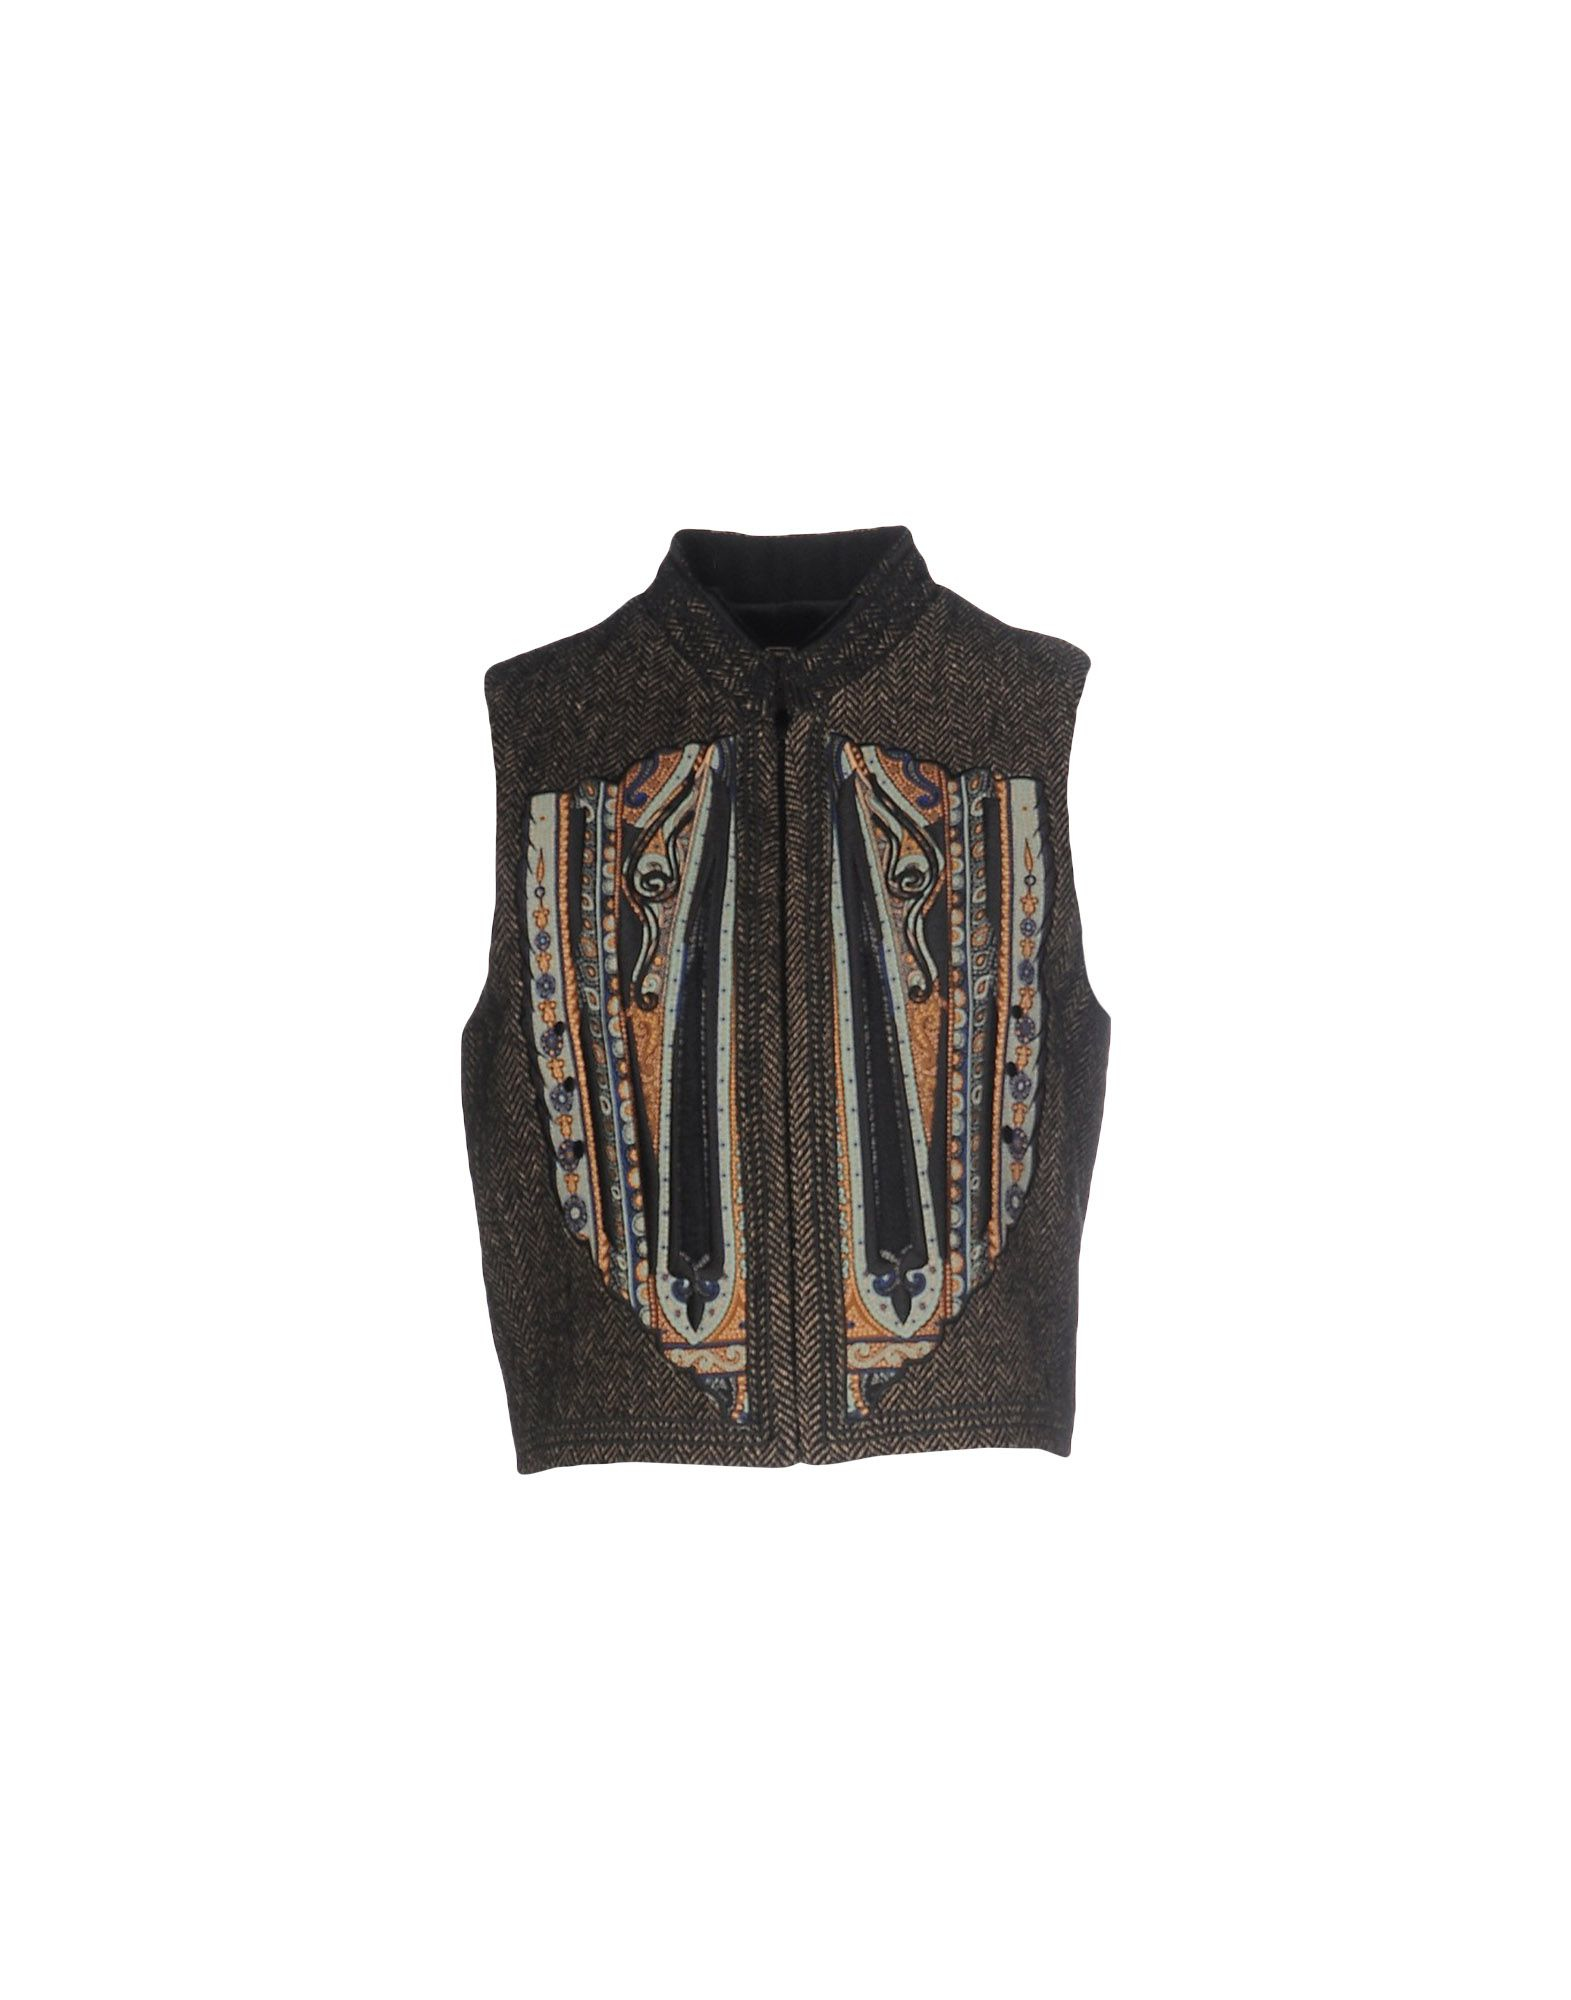 Etro Jacket in Black